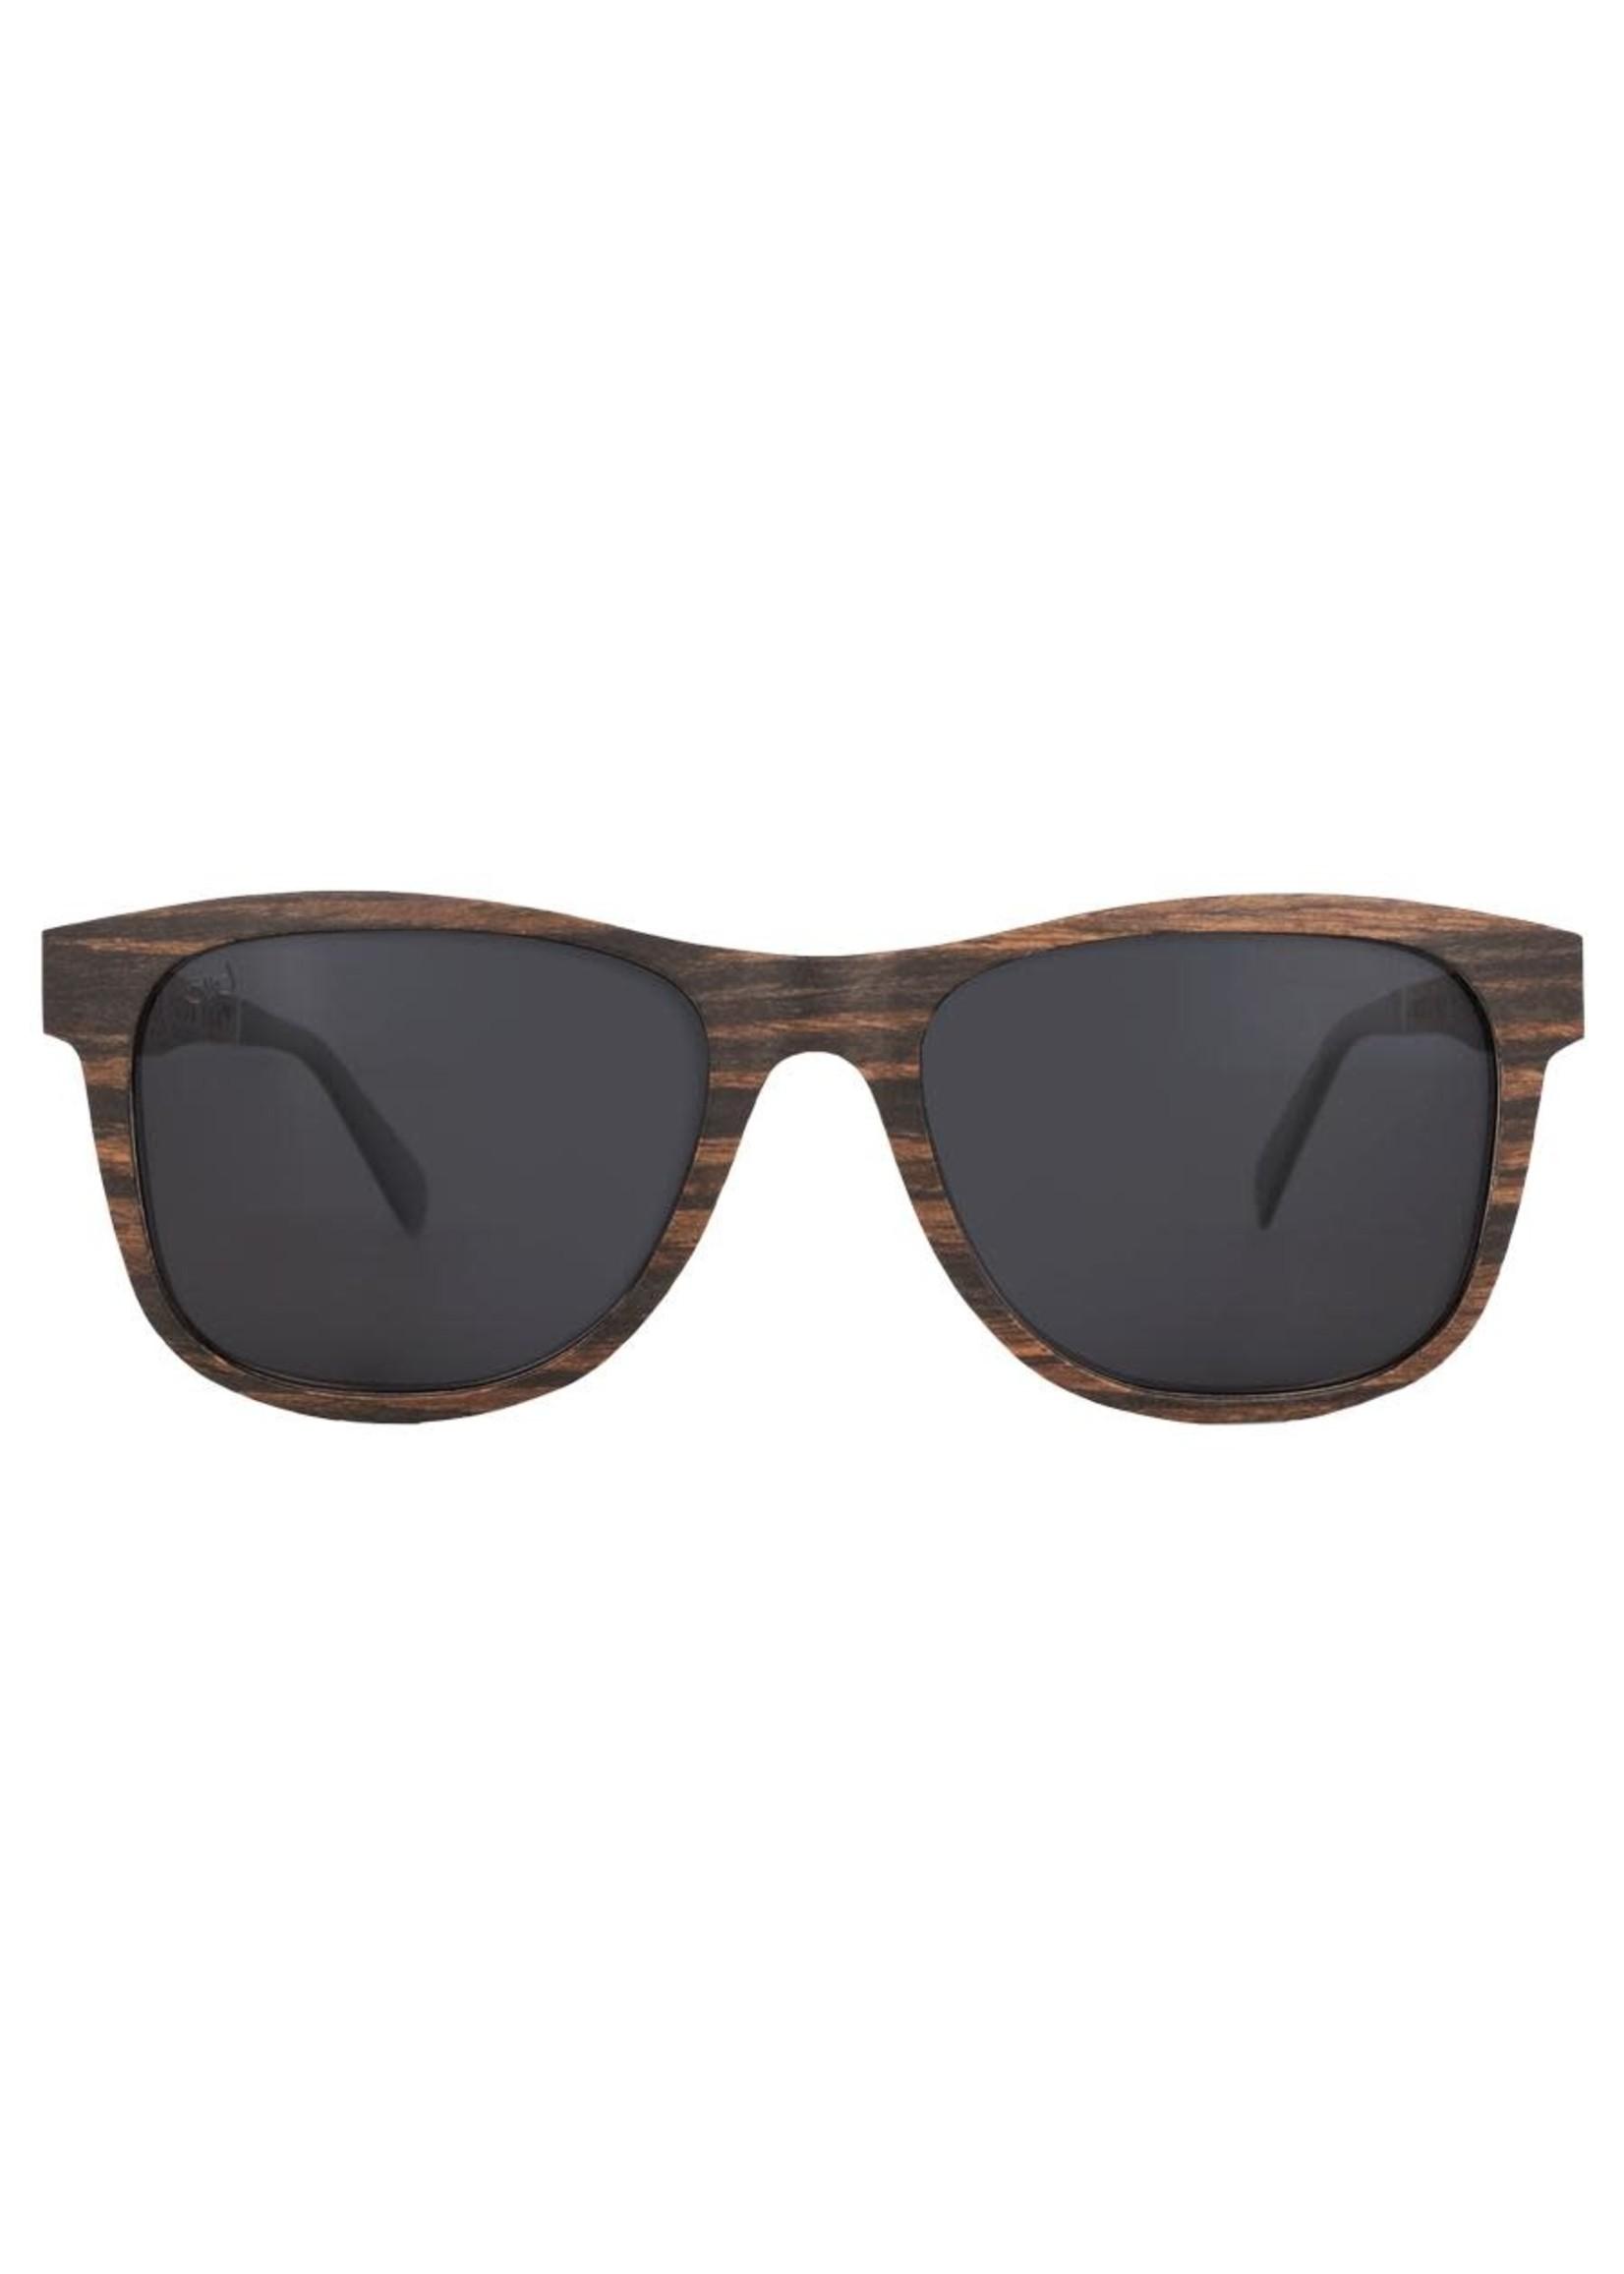 Bird Eyewear Bird Hawfinch Sunglasses